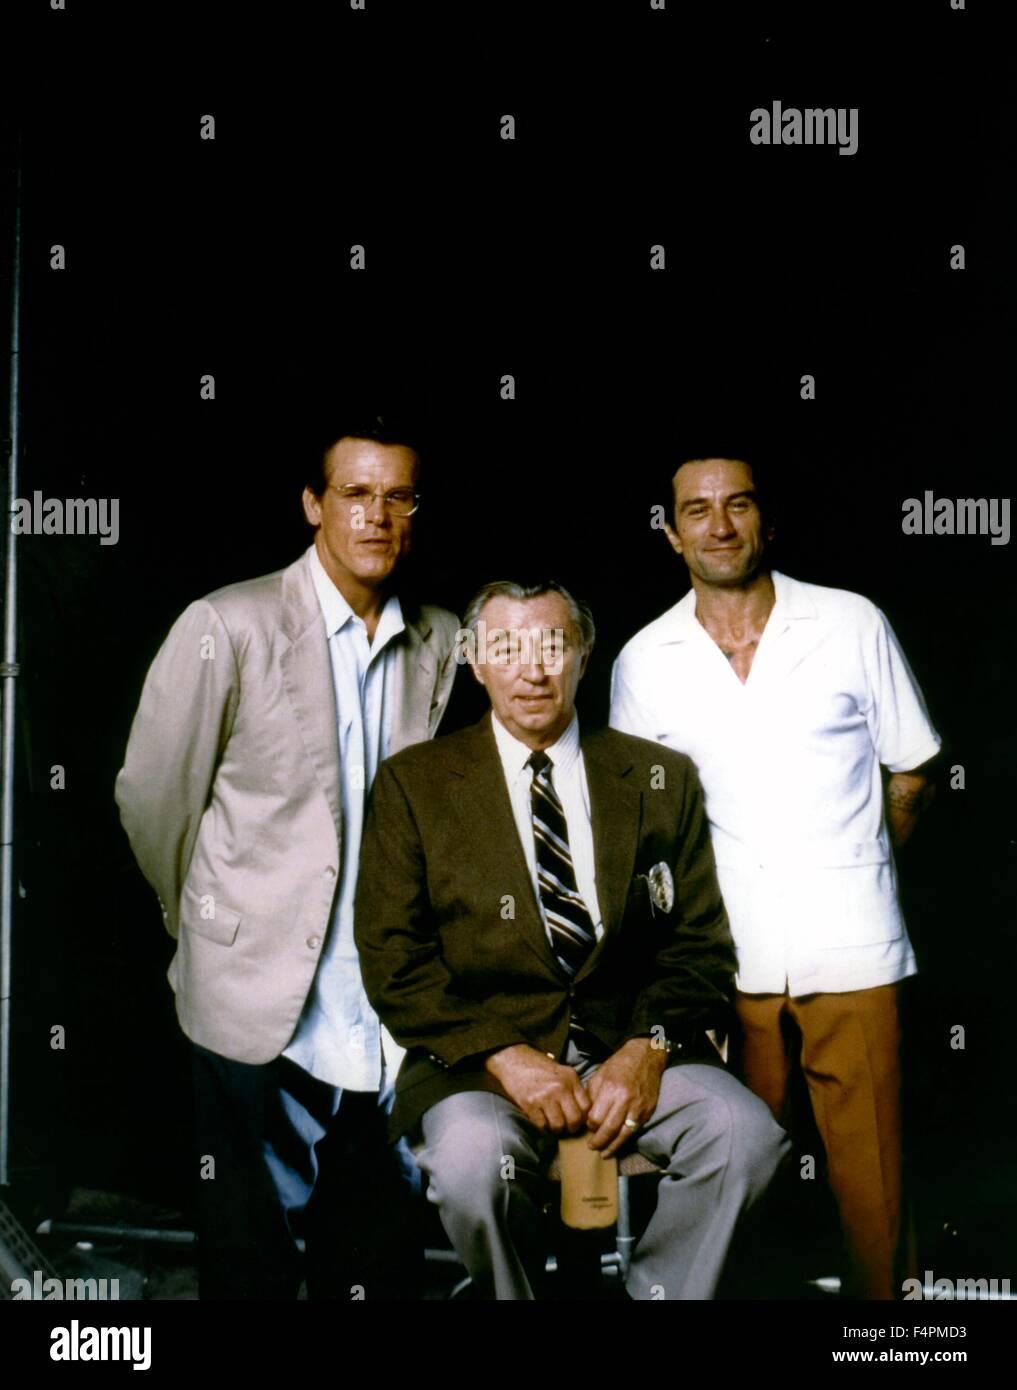 Nick Nolte, Robert Mitchum e Robert de Niro / Cape Fear / 1991 diretto da Martin Scorsese [Universal Pictures] Immagini Stock